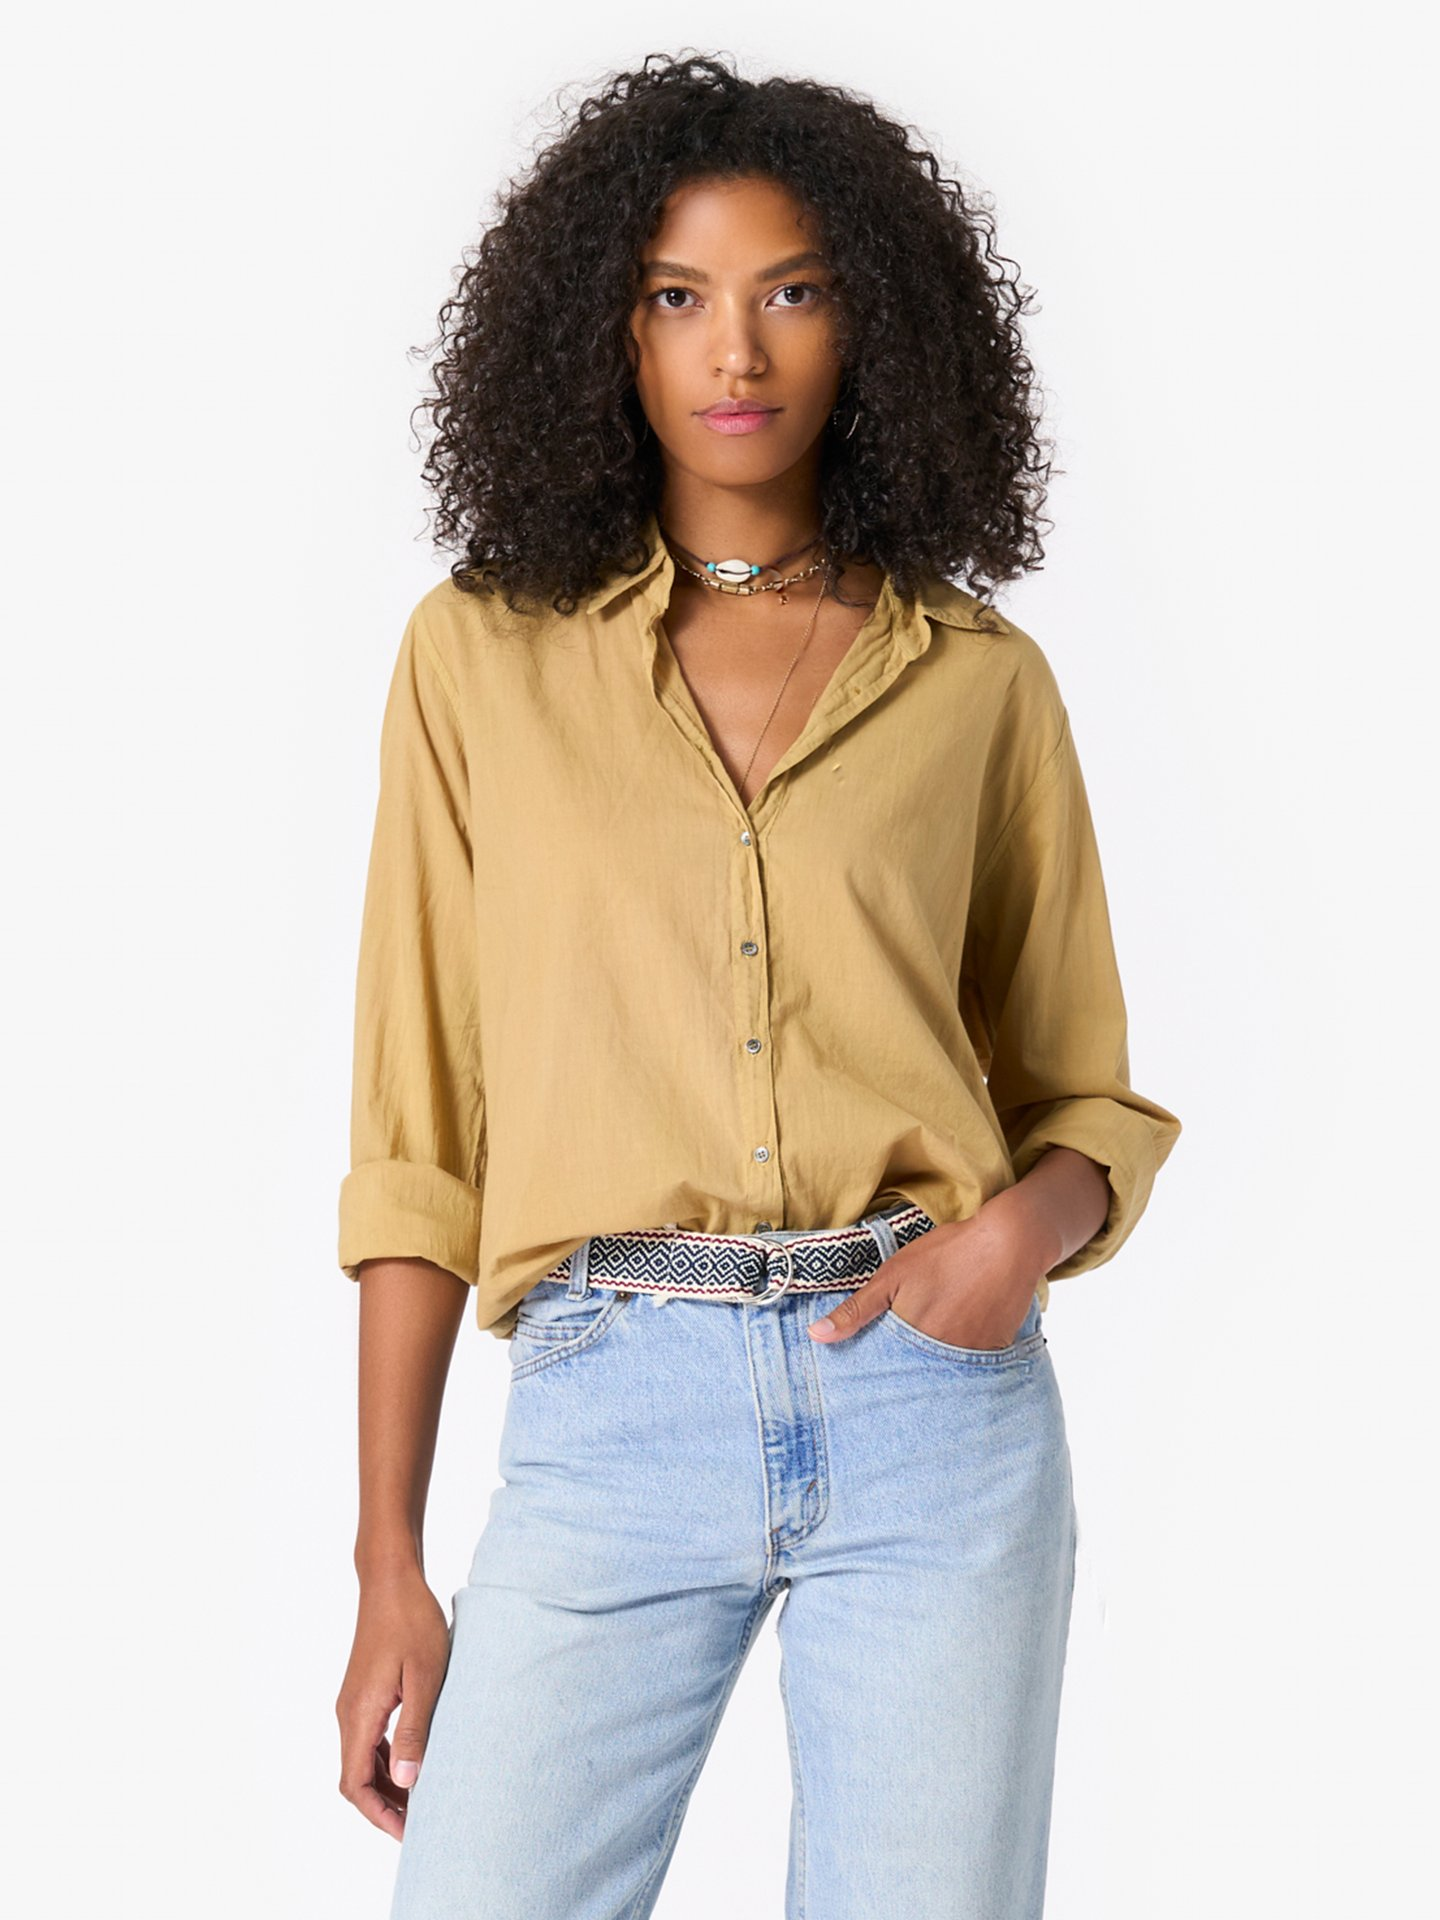 Xirena, Beau Shirt, Safari, Oversize Shirt